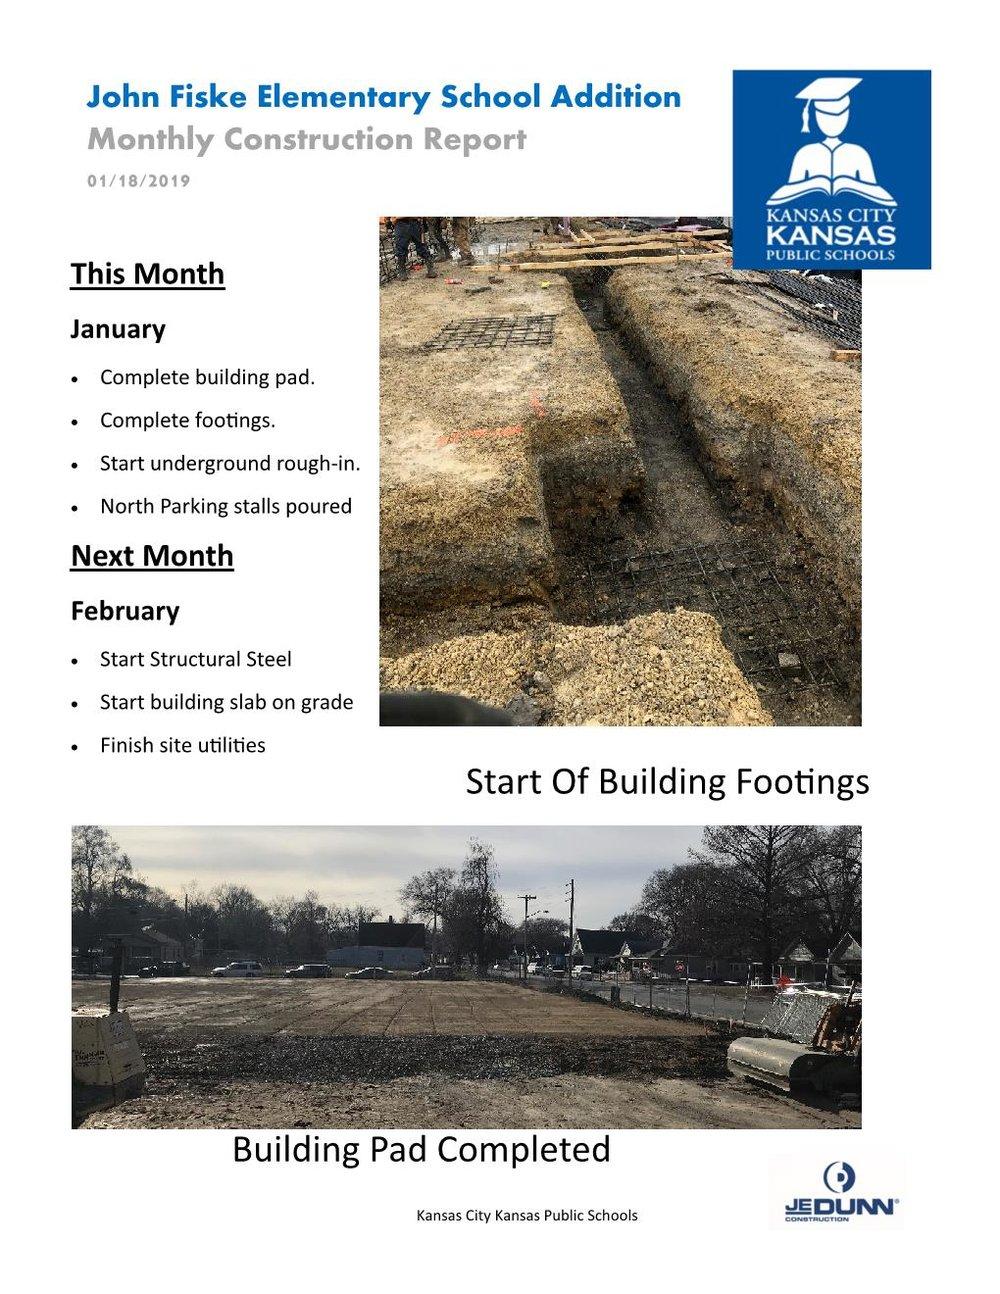 2019.01.14-WP 7A January Photo Report John Fiske.jpg